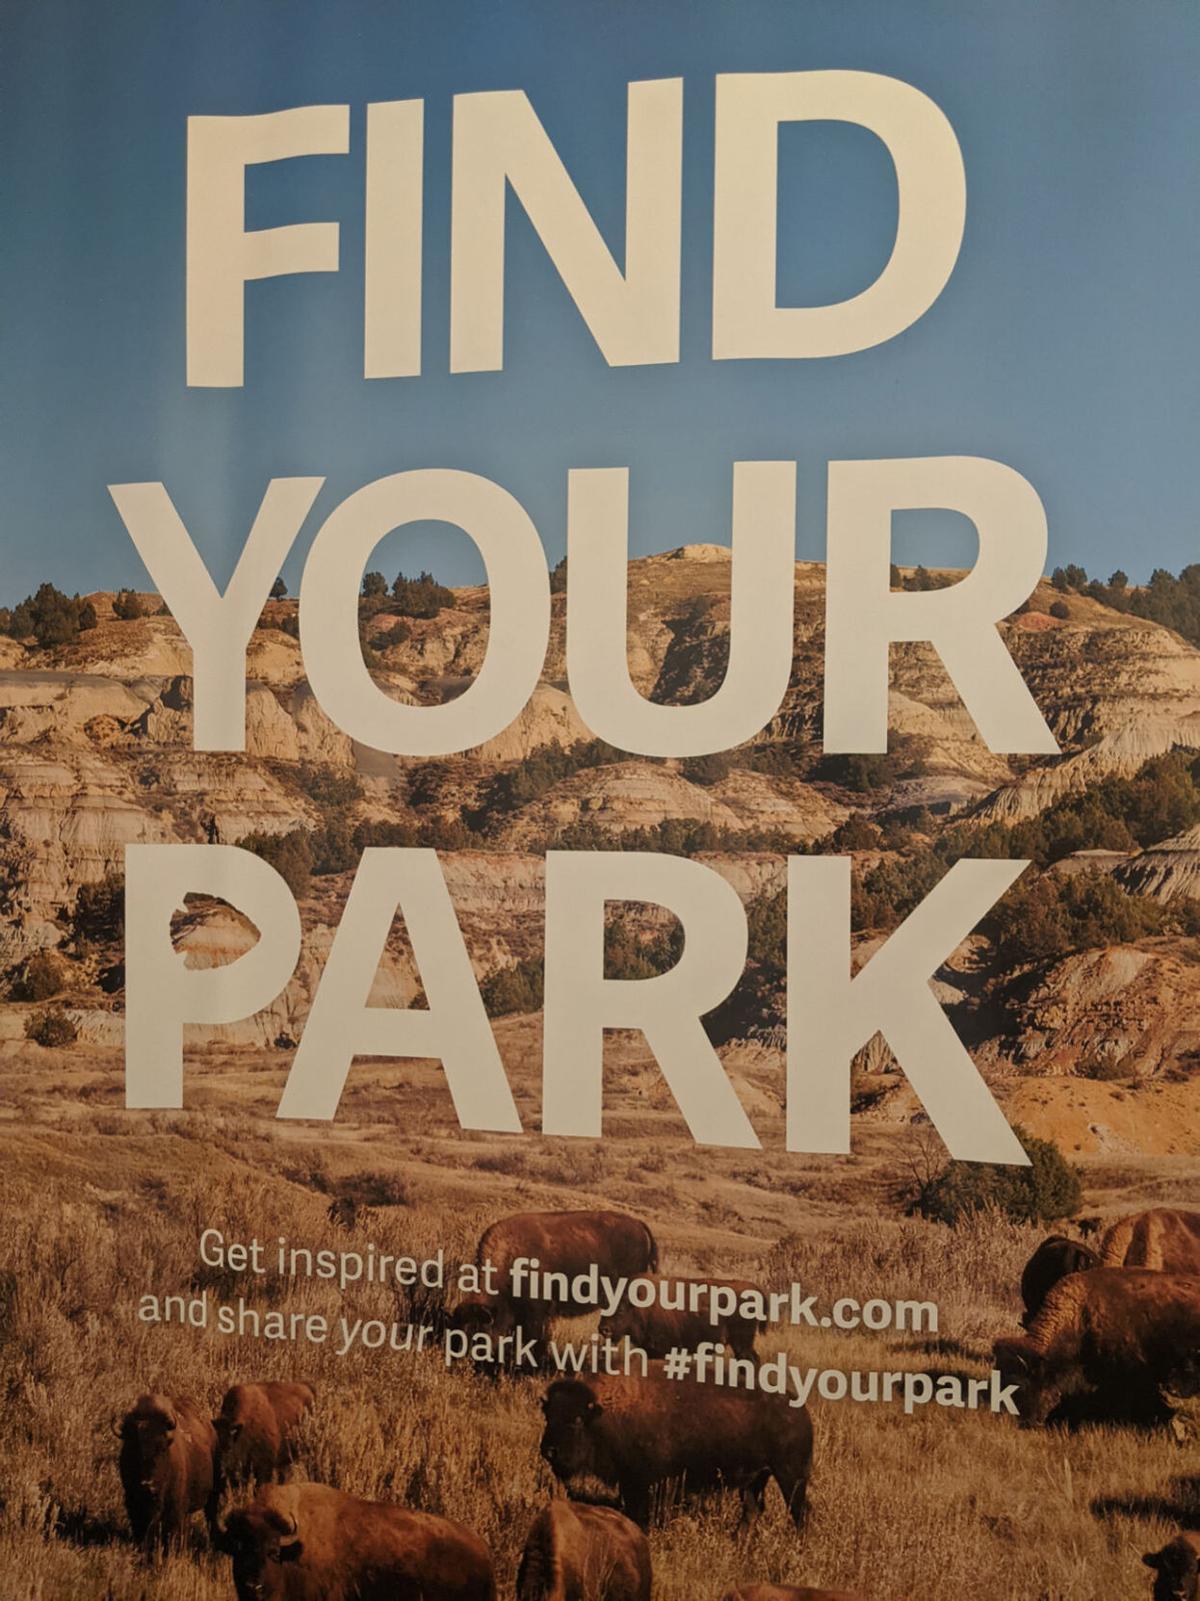 Road trip find your parkc.jpg